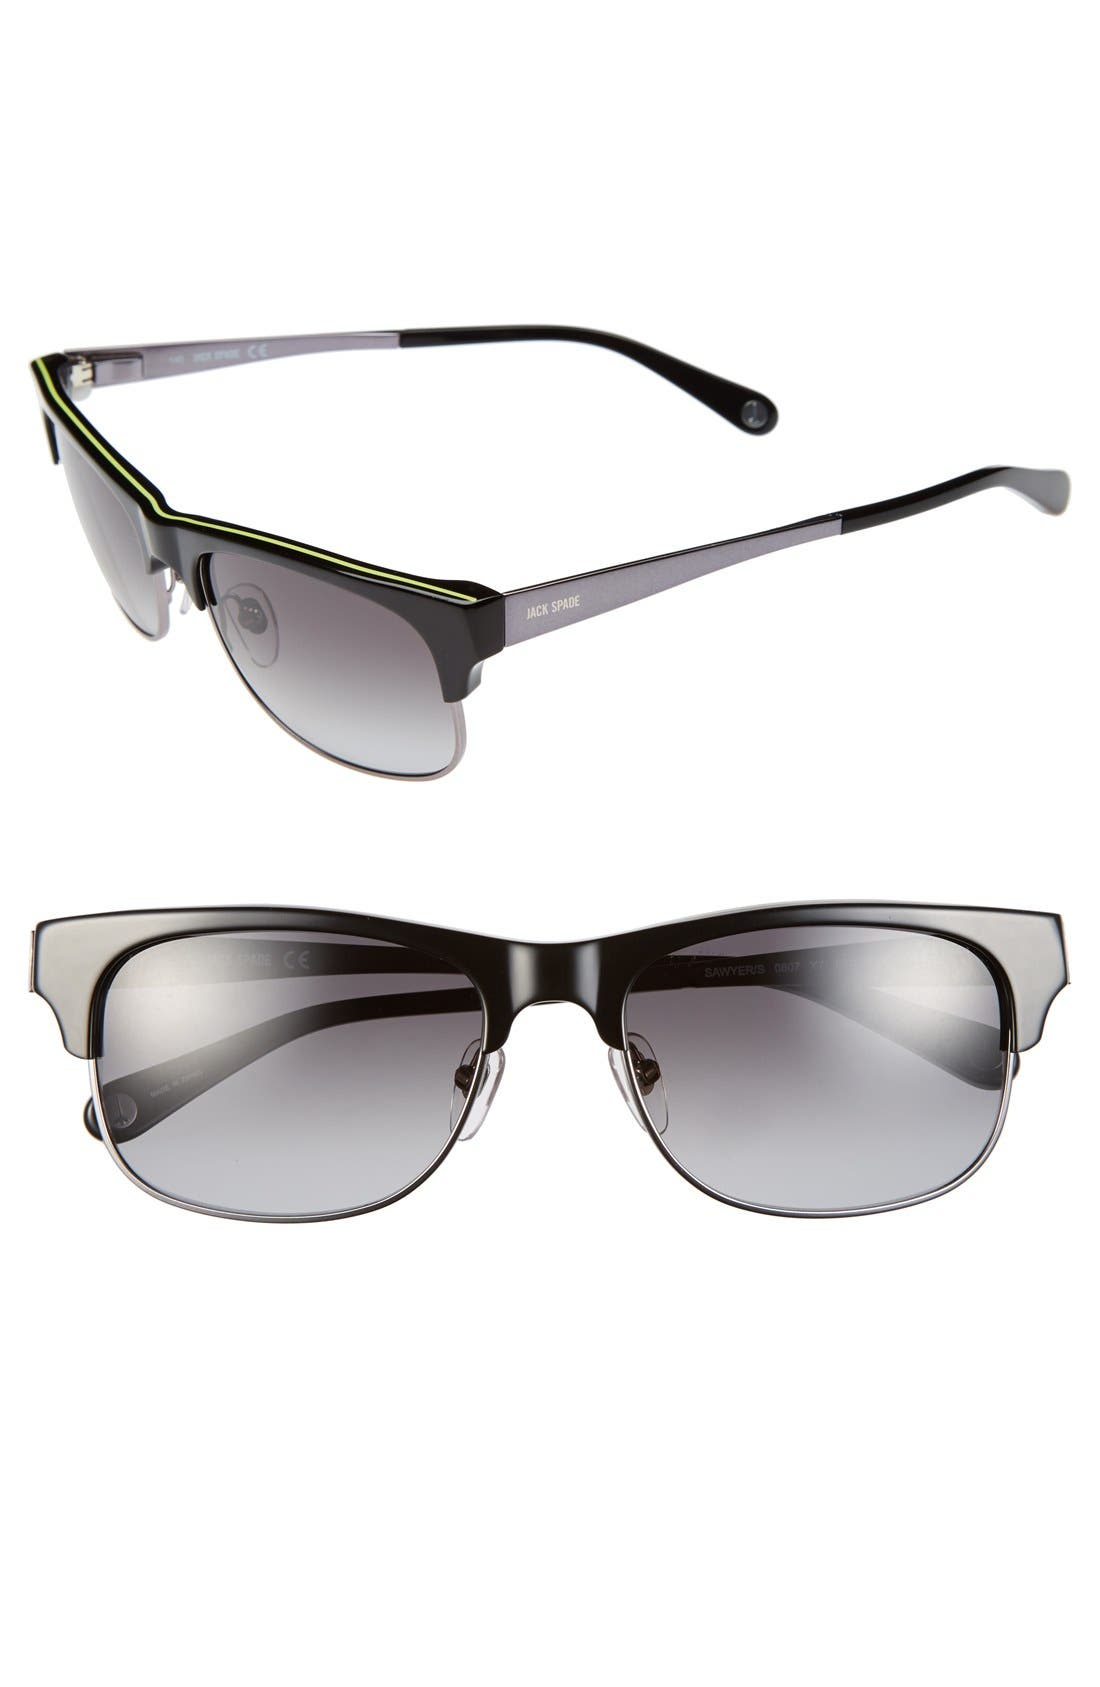 Main Image - Jack Spade 'Sawyer' 55mm Sunglasses